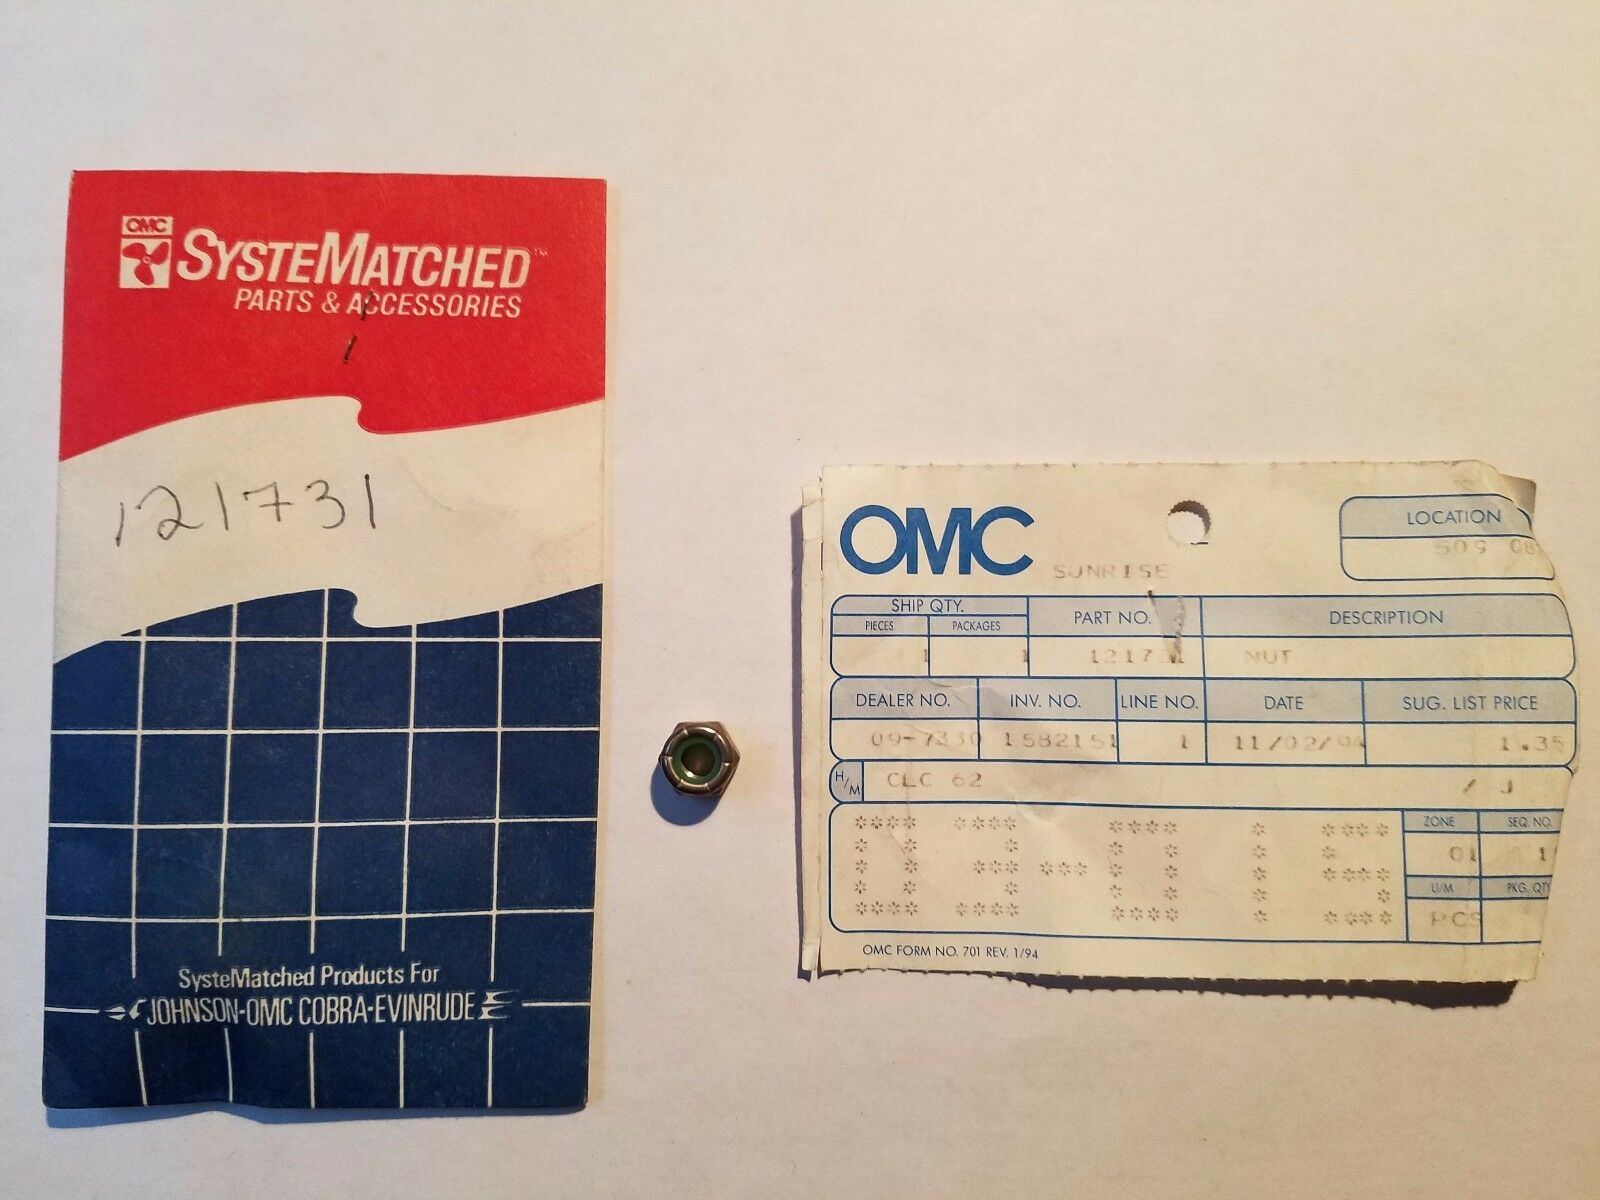 NOS OMC Evinrude Johnson Sender Mounting Part 122787.